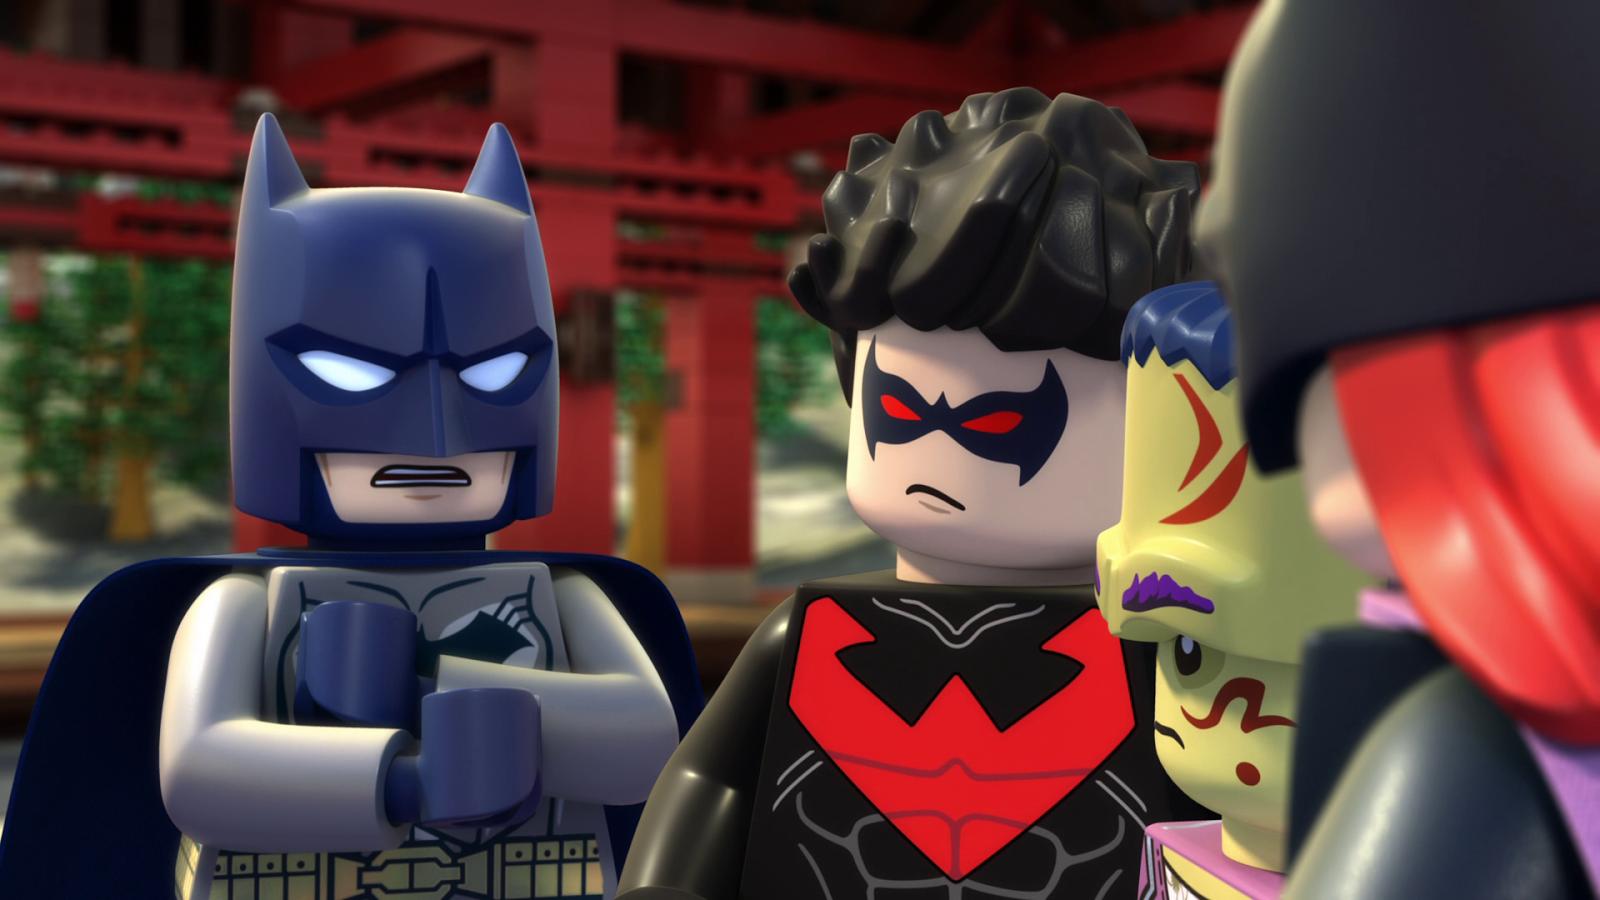 Lego DC Comics Superheroes Justice League - Gotham City Breakout (2016) 1080p BD25 2